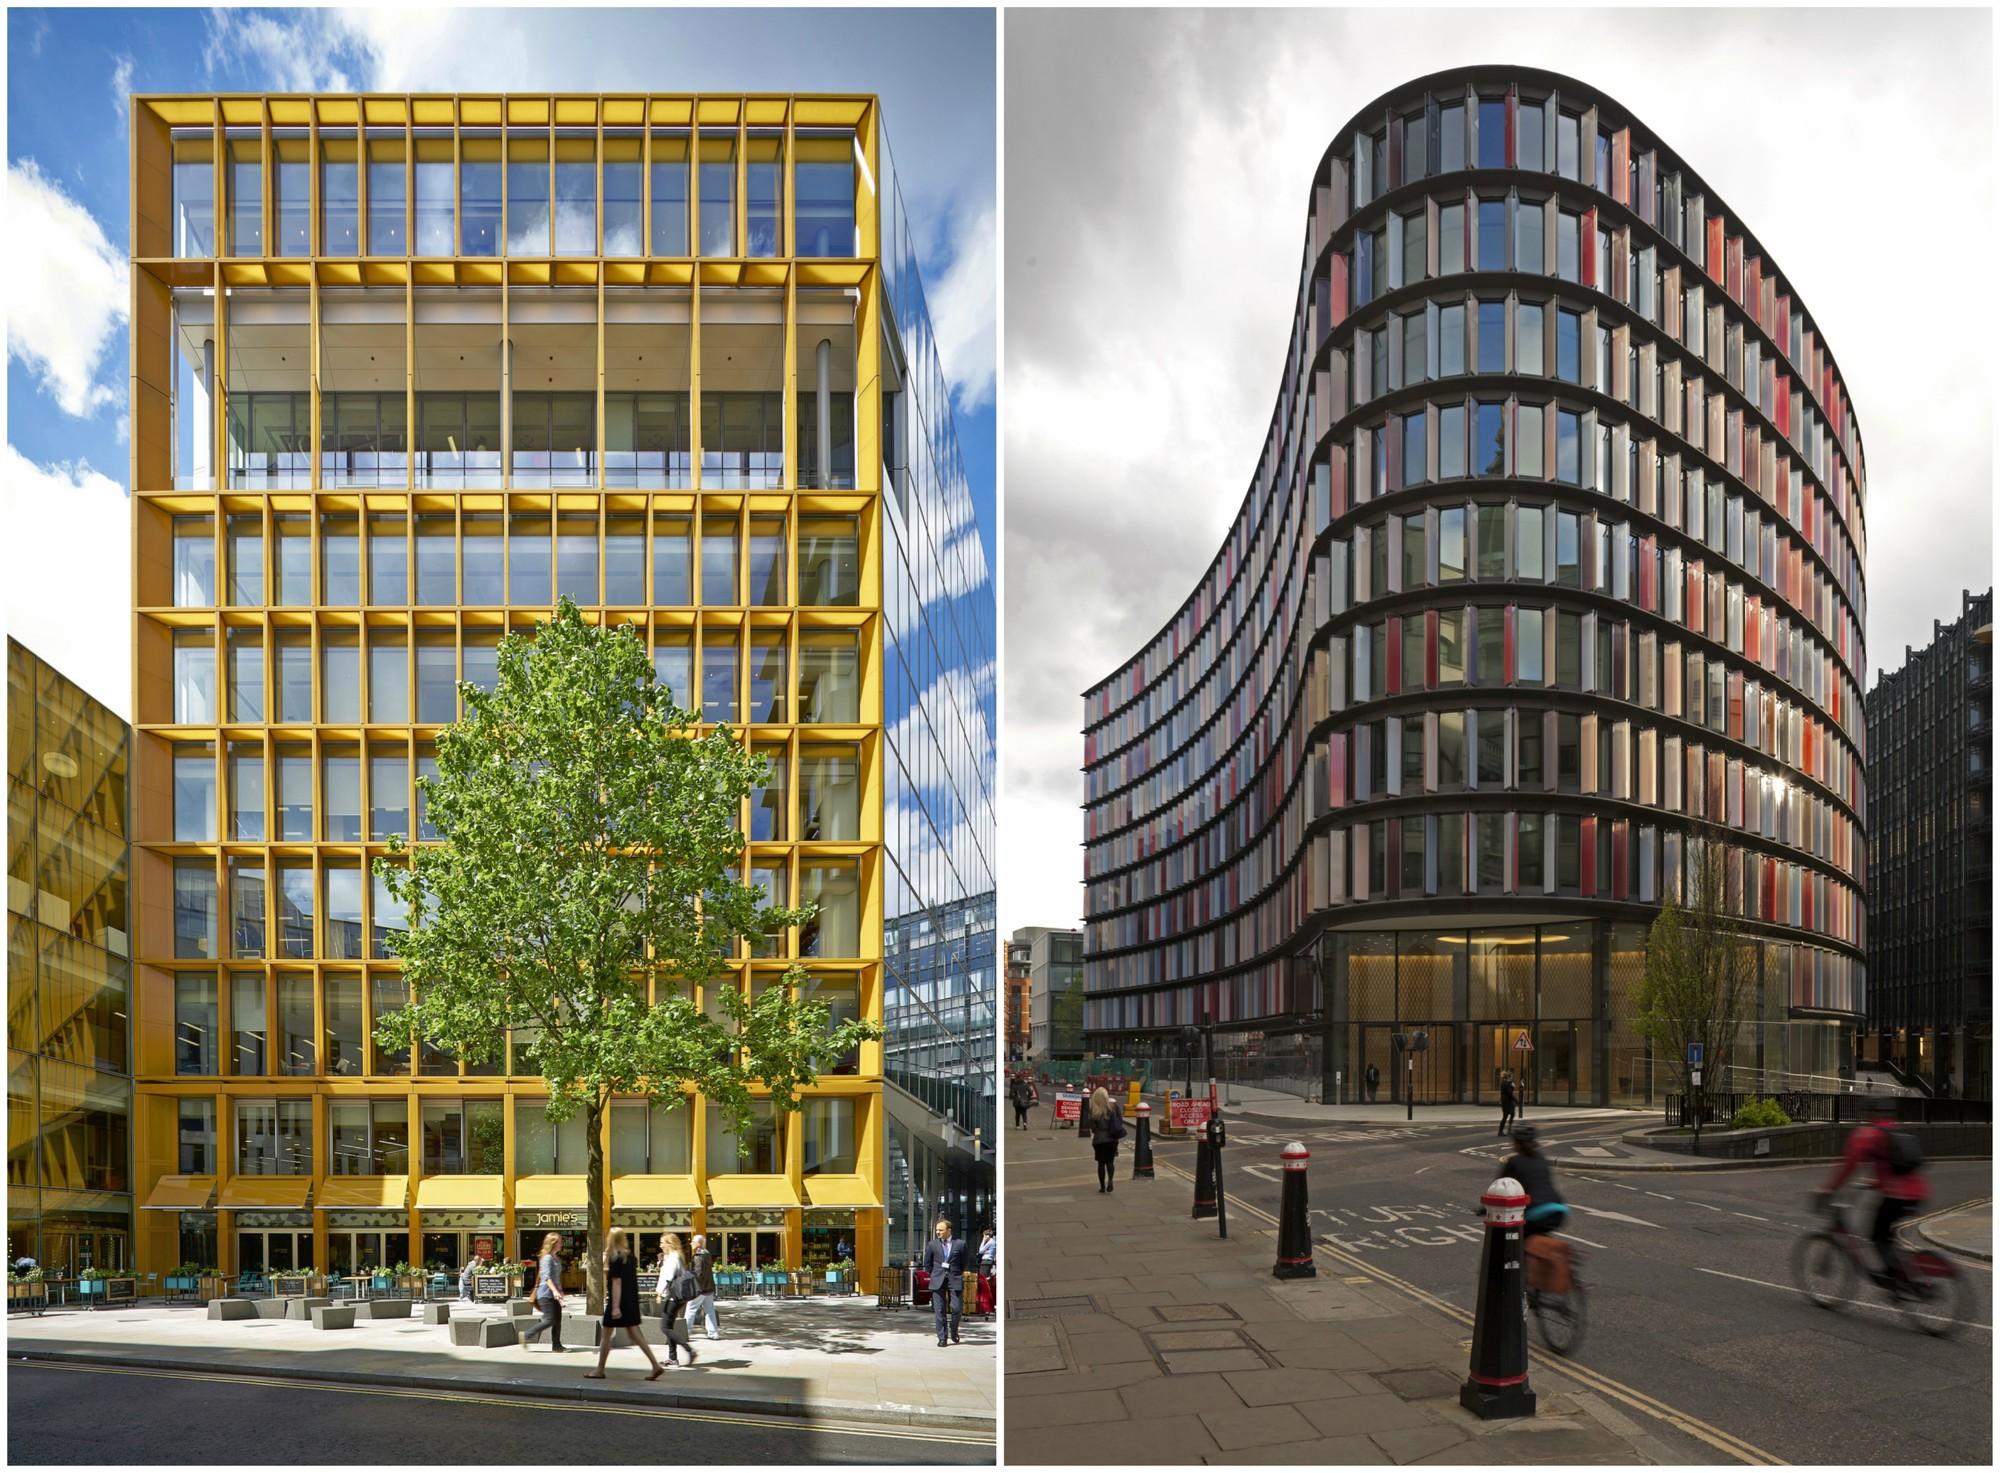 City of London Building Award 2016 Winners Announced